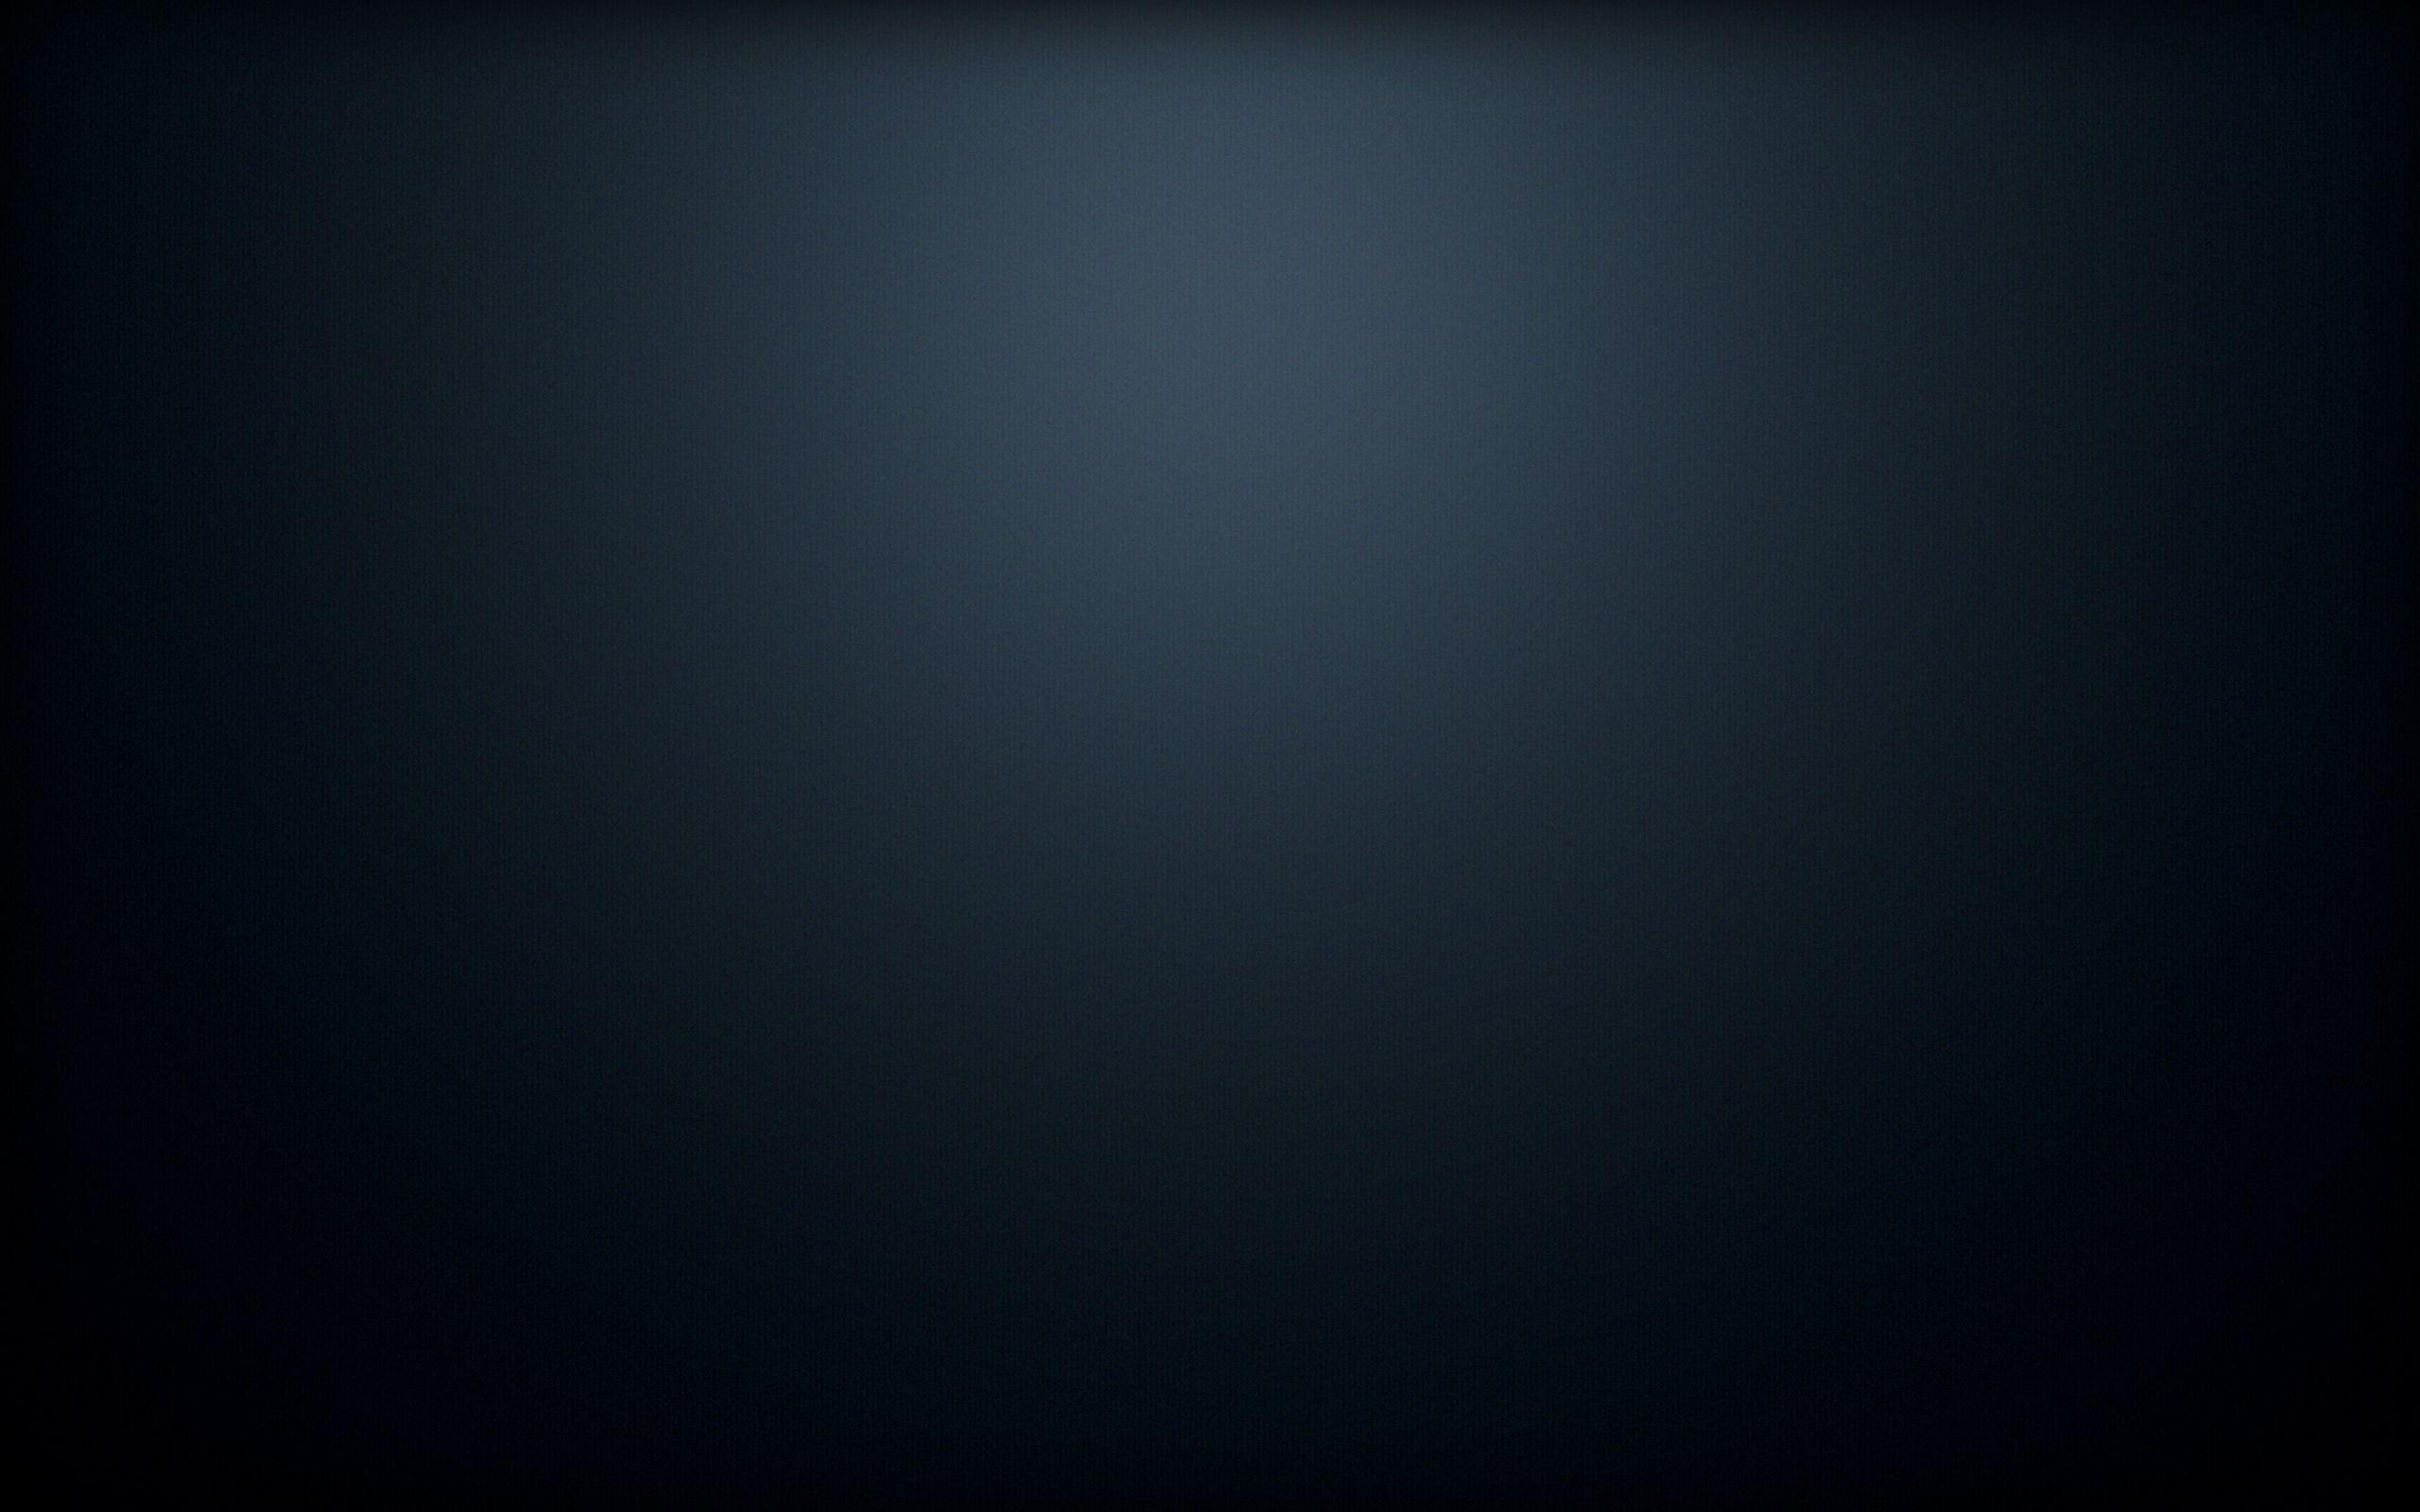 Dark Blue Texture HD Wide Wallpaper for Widescreen (47 Wallpapers) – HD  Wallpapers